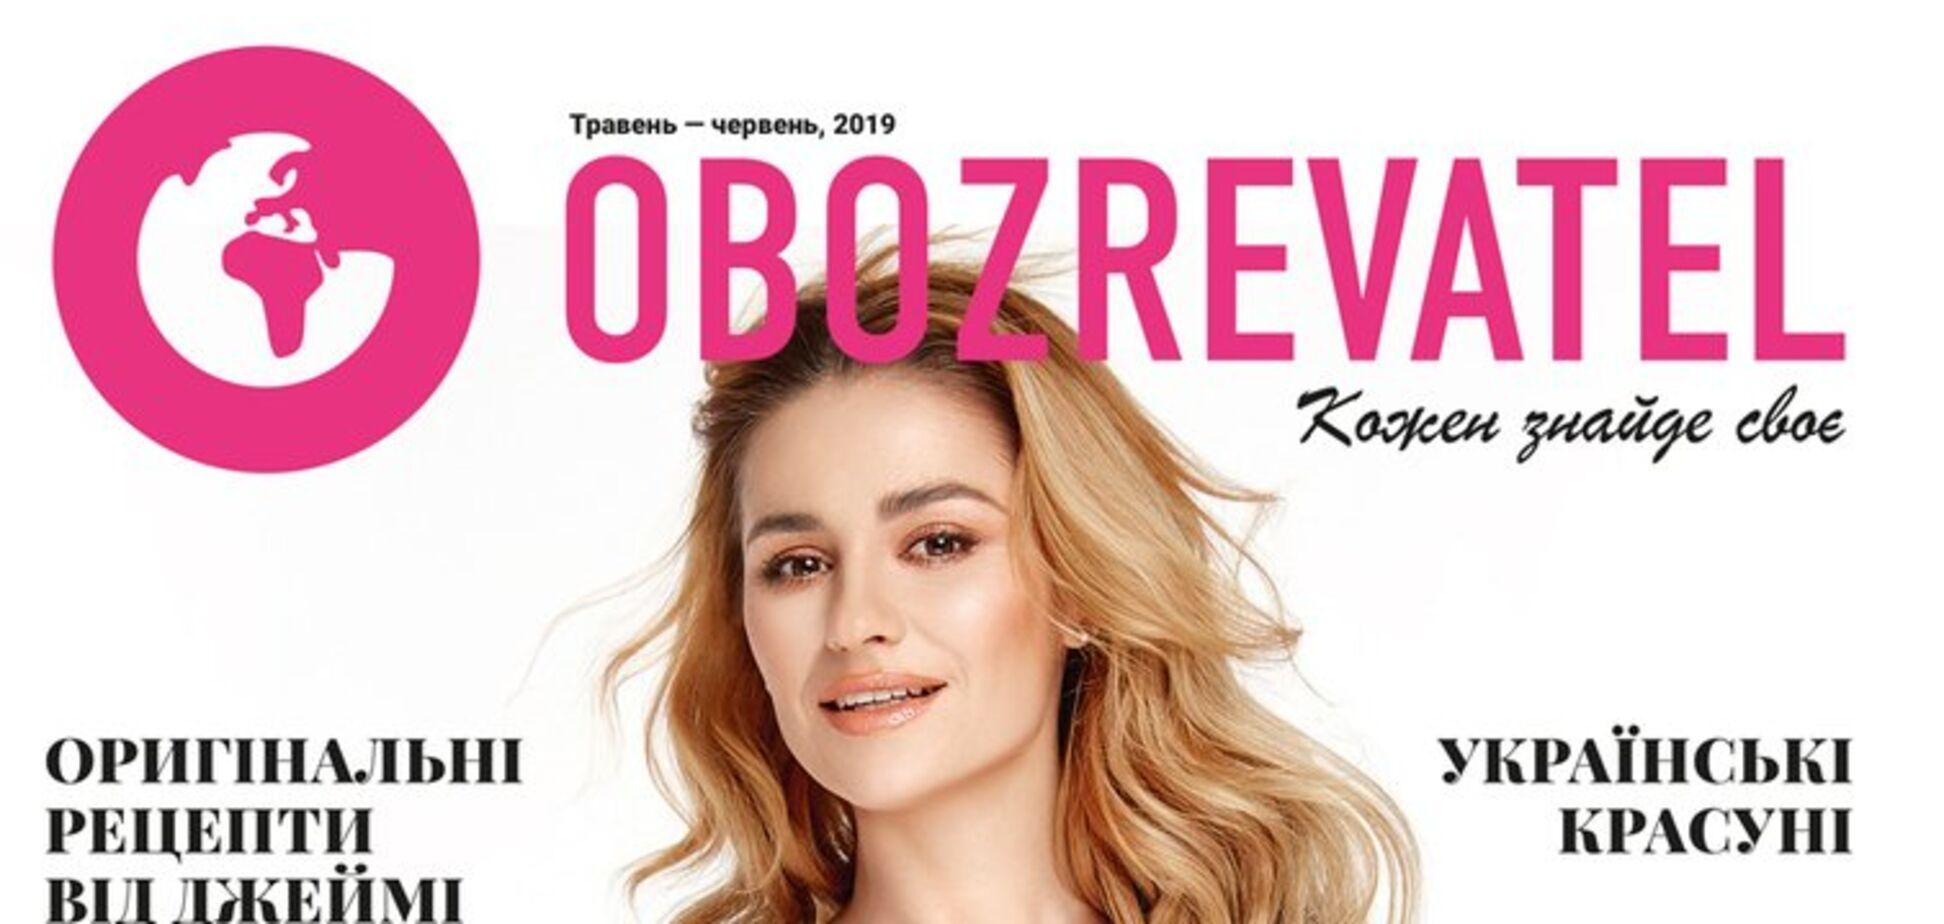 Второй номер журнала Obozrevatel: звезда 'Квартала 95' и больше интересного контента